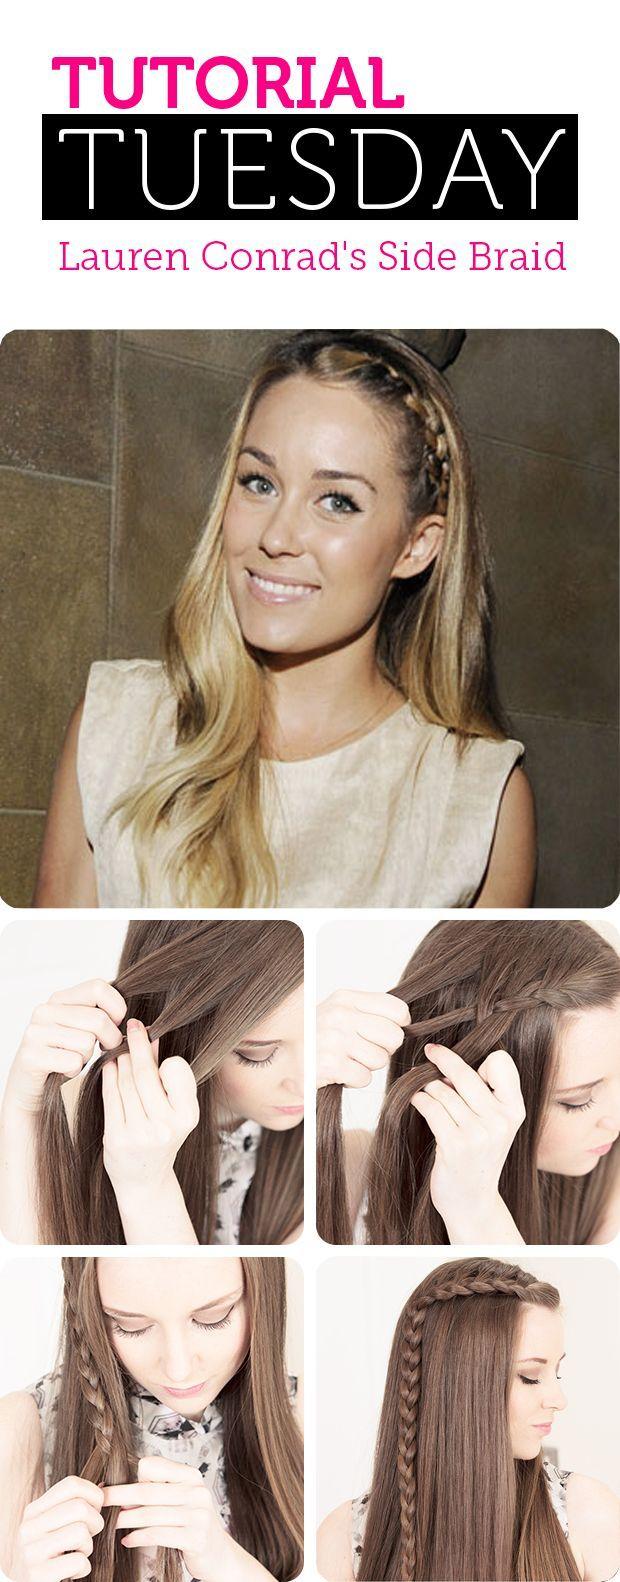 Tutorial Tuesday: Lauren Conrad's Side Braid | TheBeautyPlace Blog # side Braids lauren conrad Tutorial Tuesday: Lauren Conrad's Side Braid #laurenconradhair